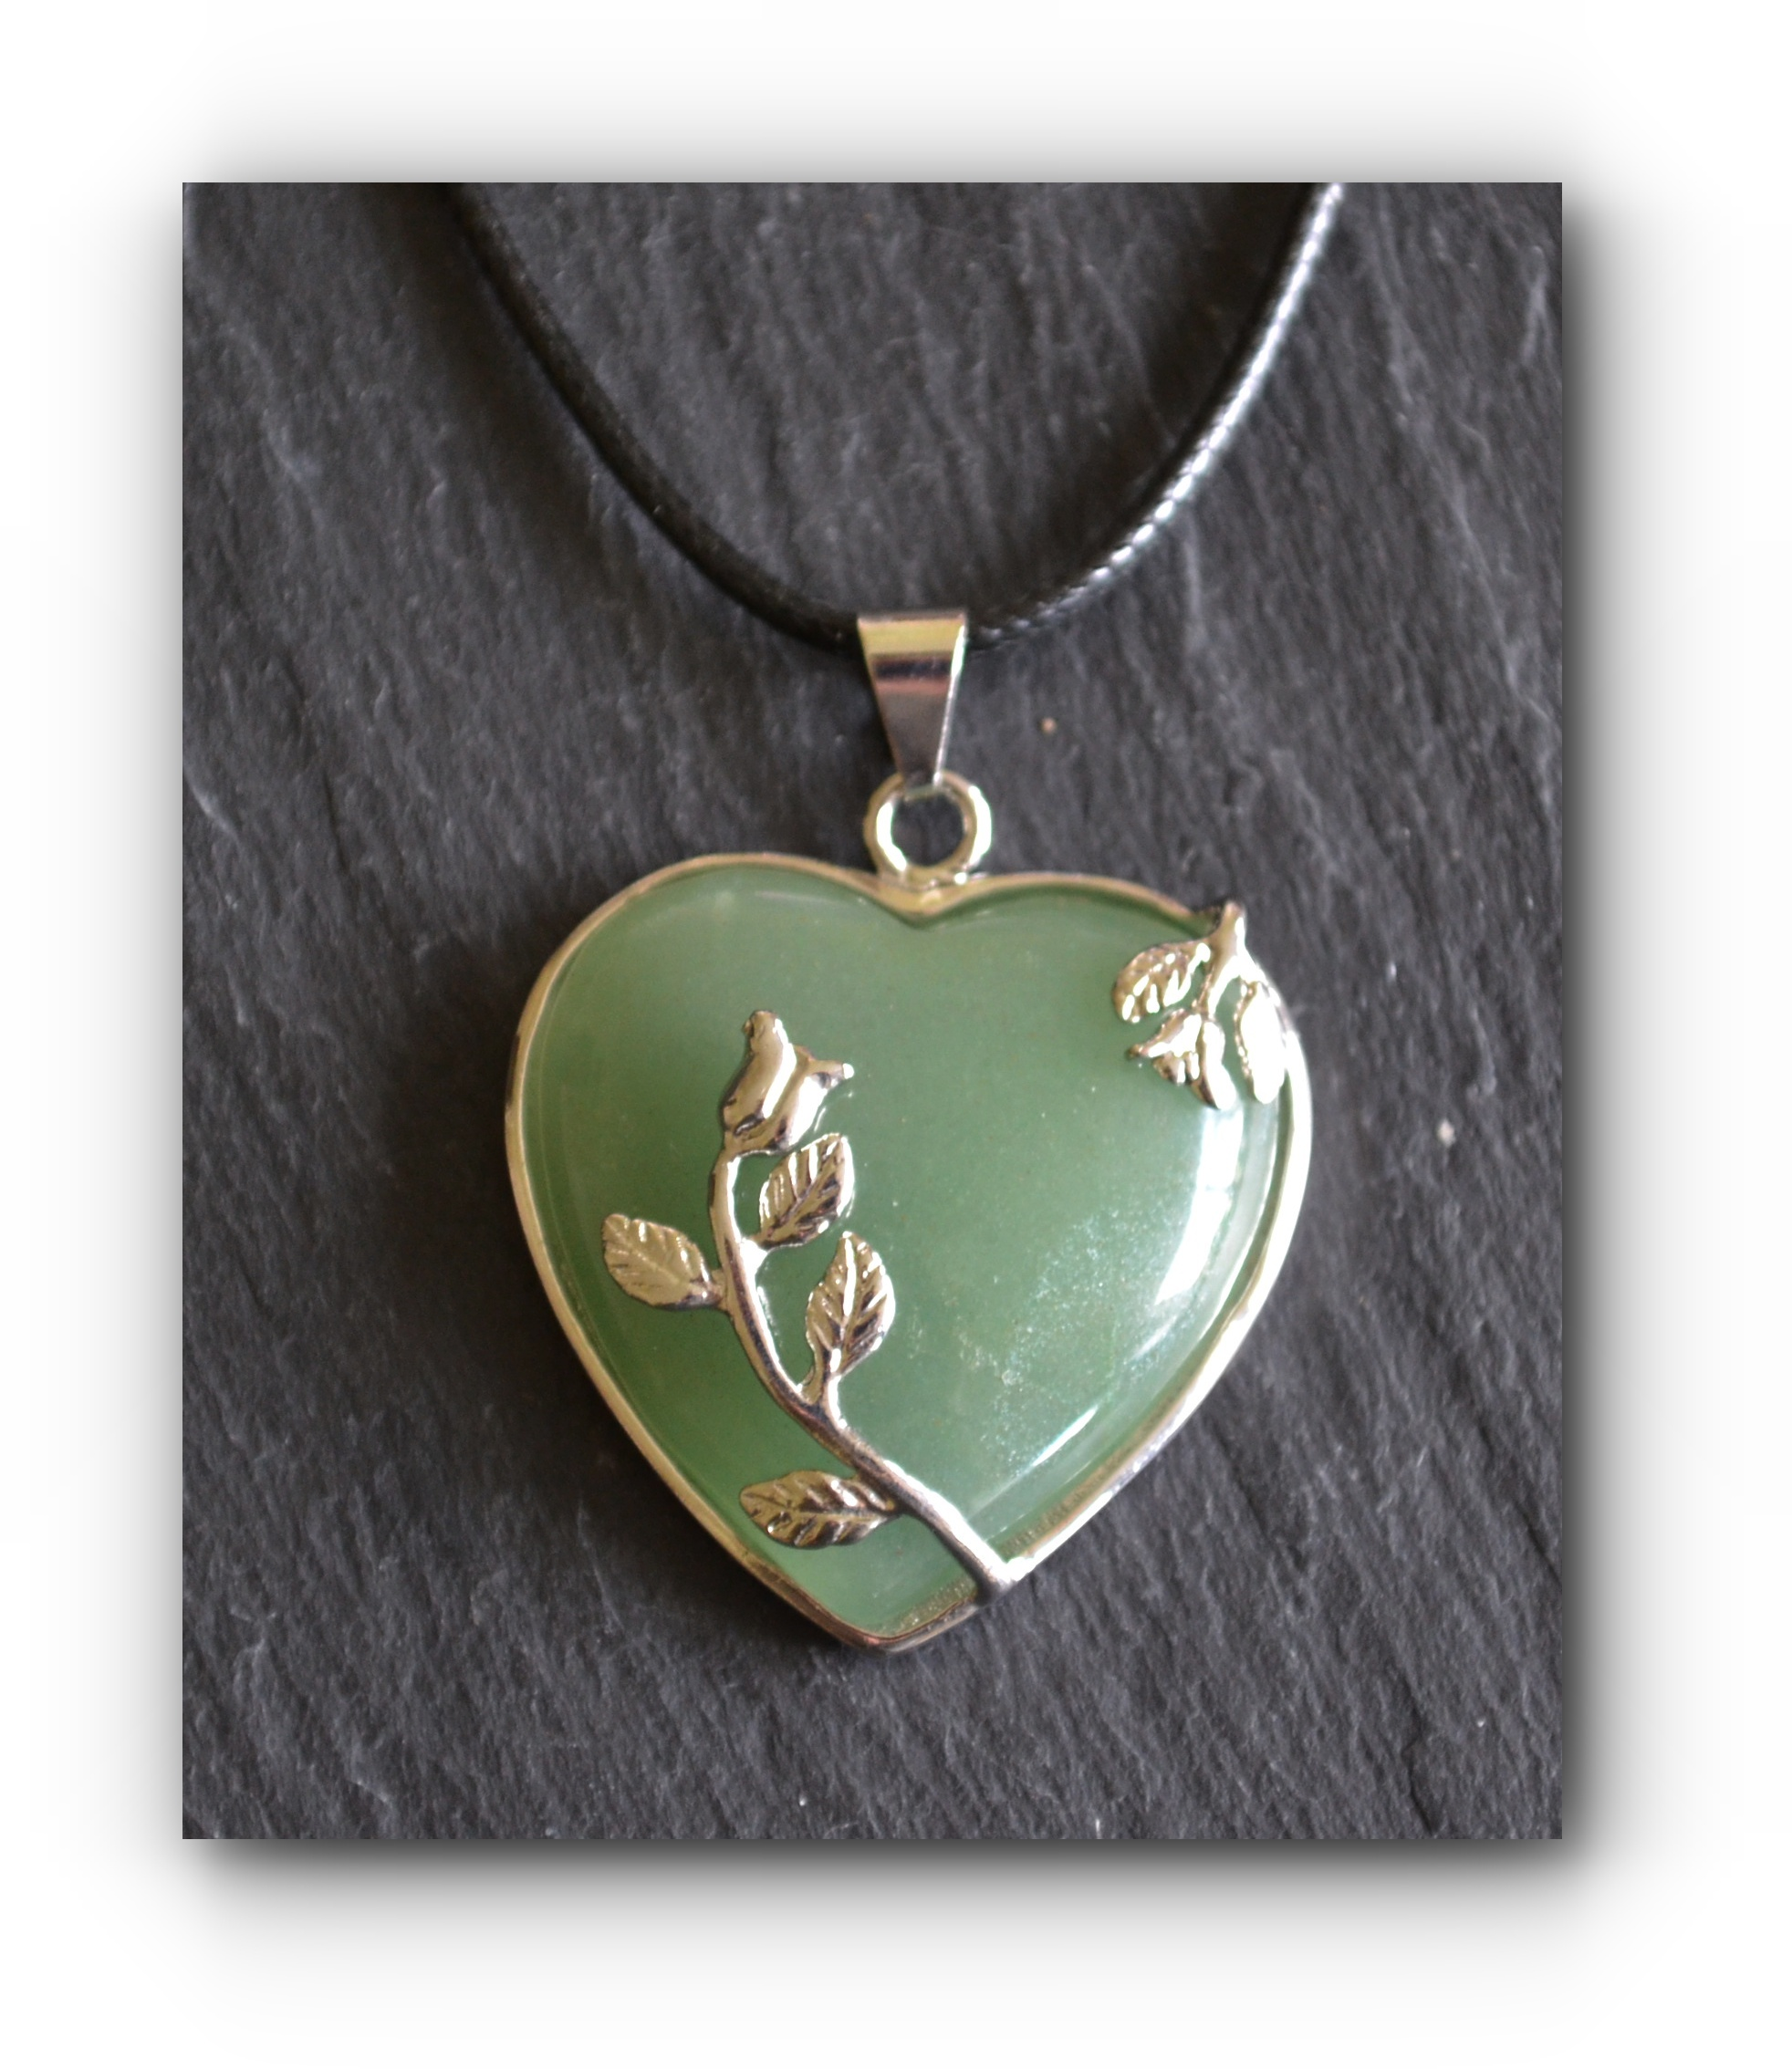 Green aventurine heart rose pendant on black cord necklace mystic wish green aventurine heart rose pendant on black cord necklace aloadofball Image collections